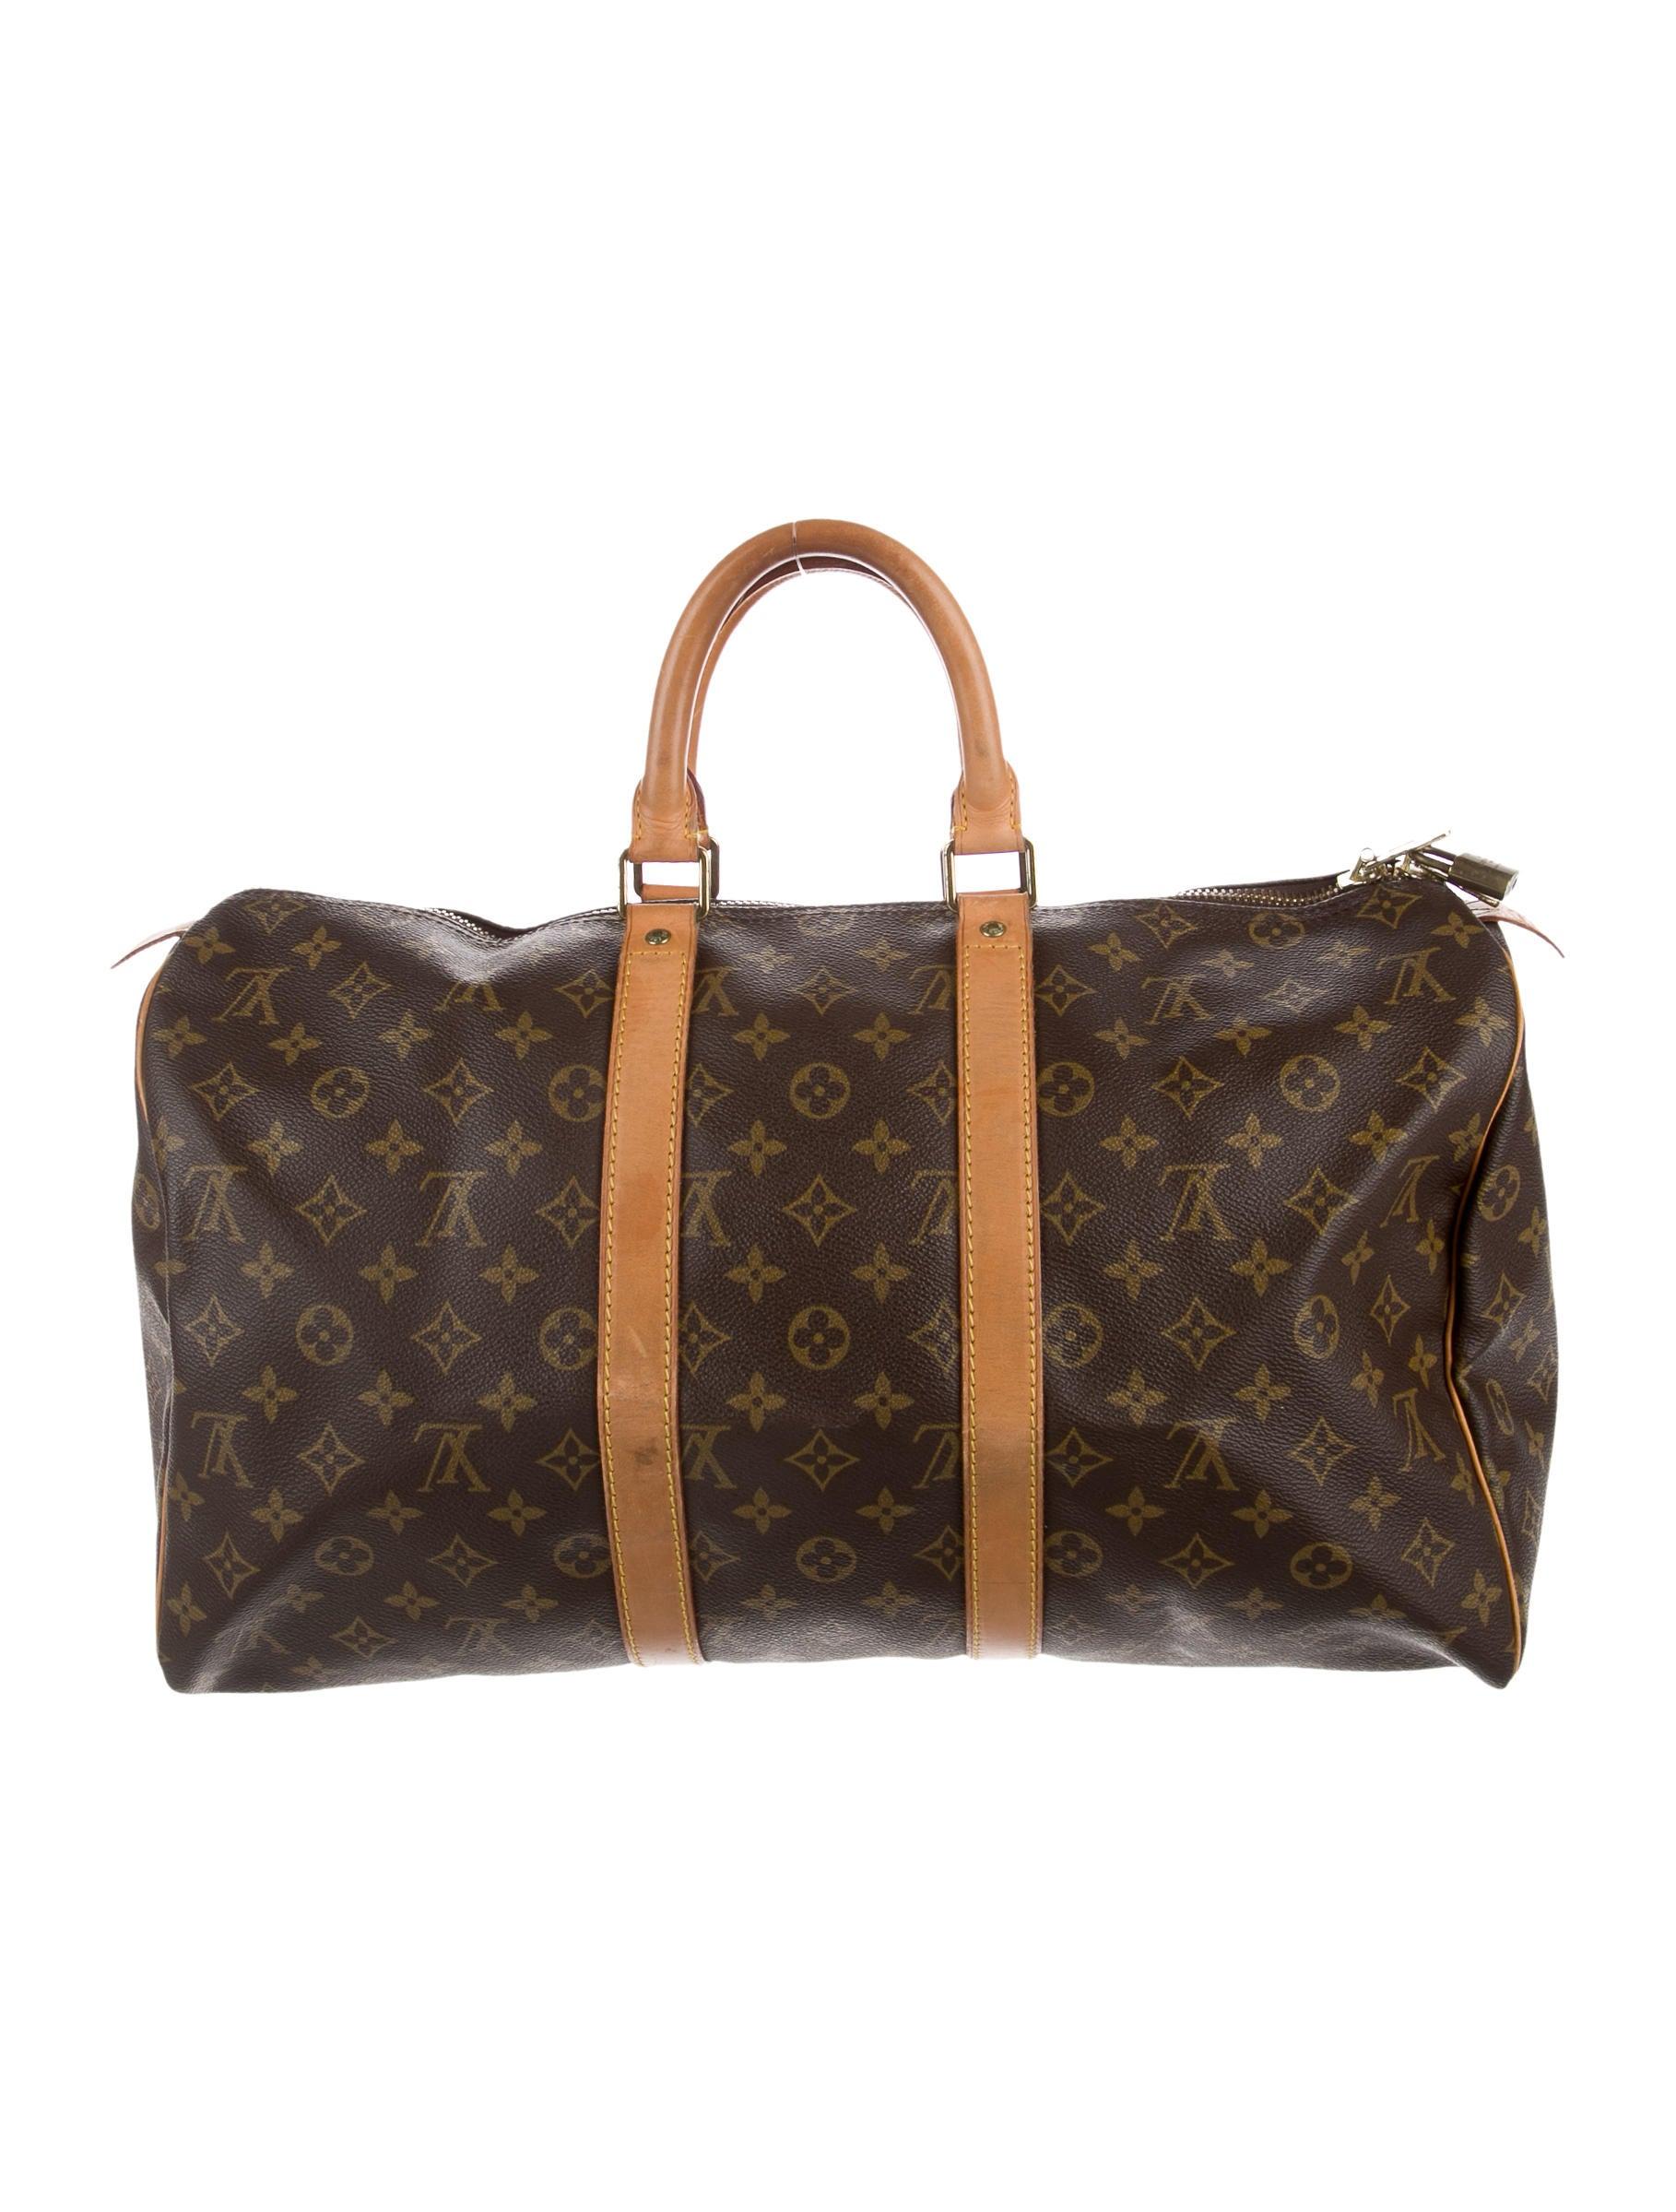 louis vuitton monogram keepall 45 handbags lou134086 the realreal. Black Bedroom Furniture Sets. Home Design Ideas